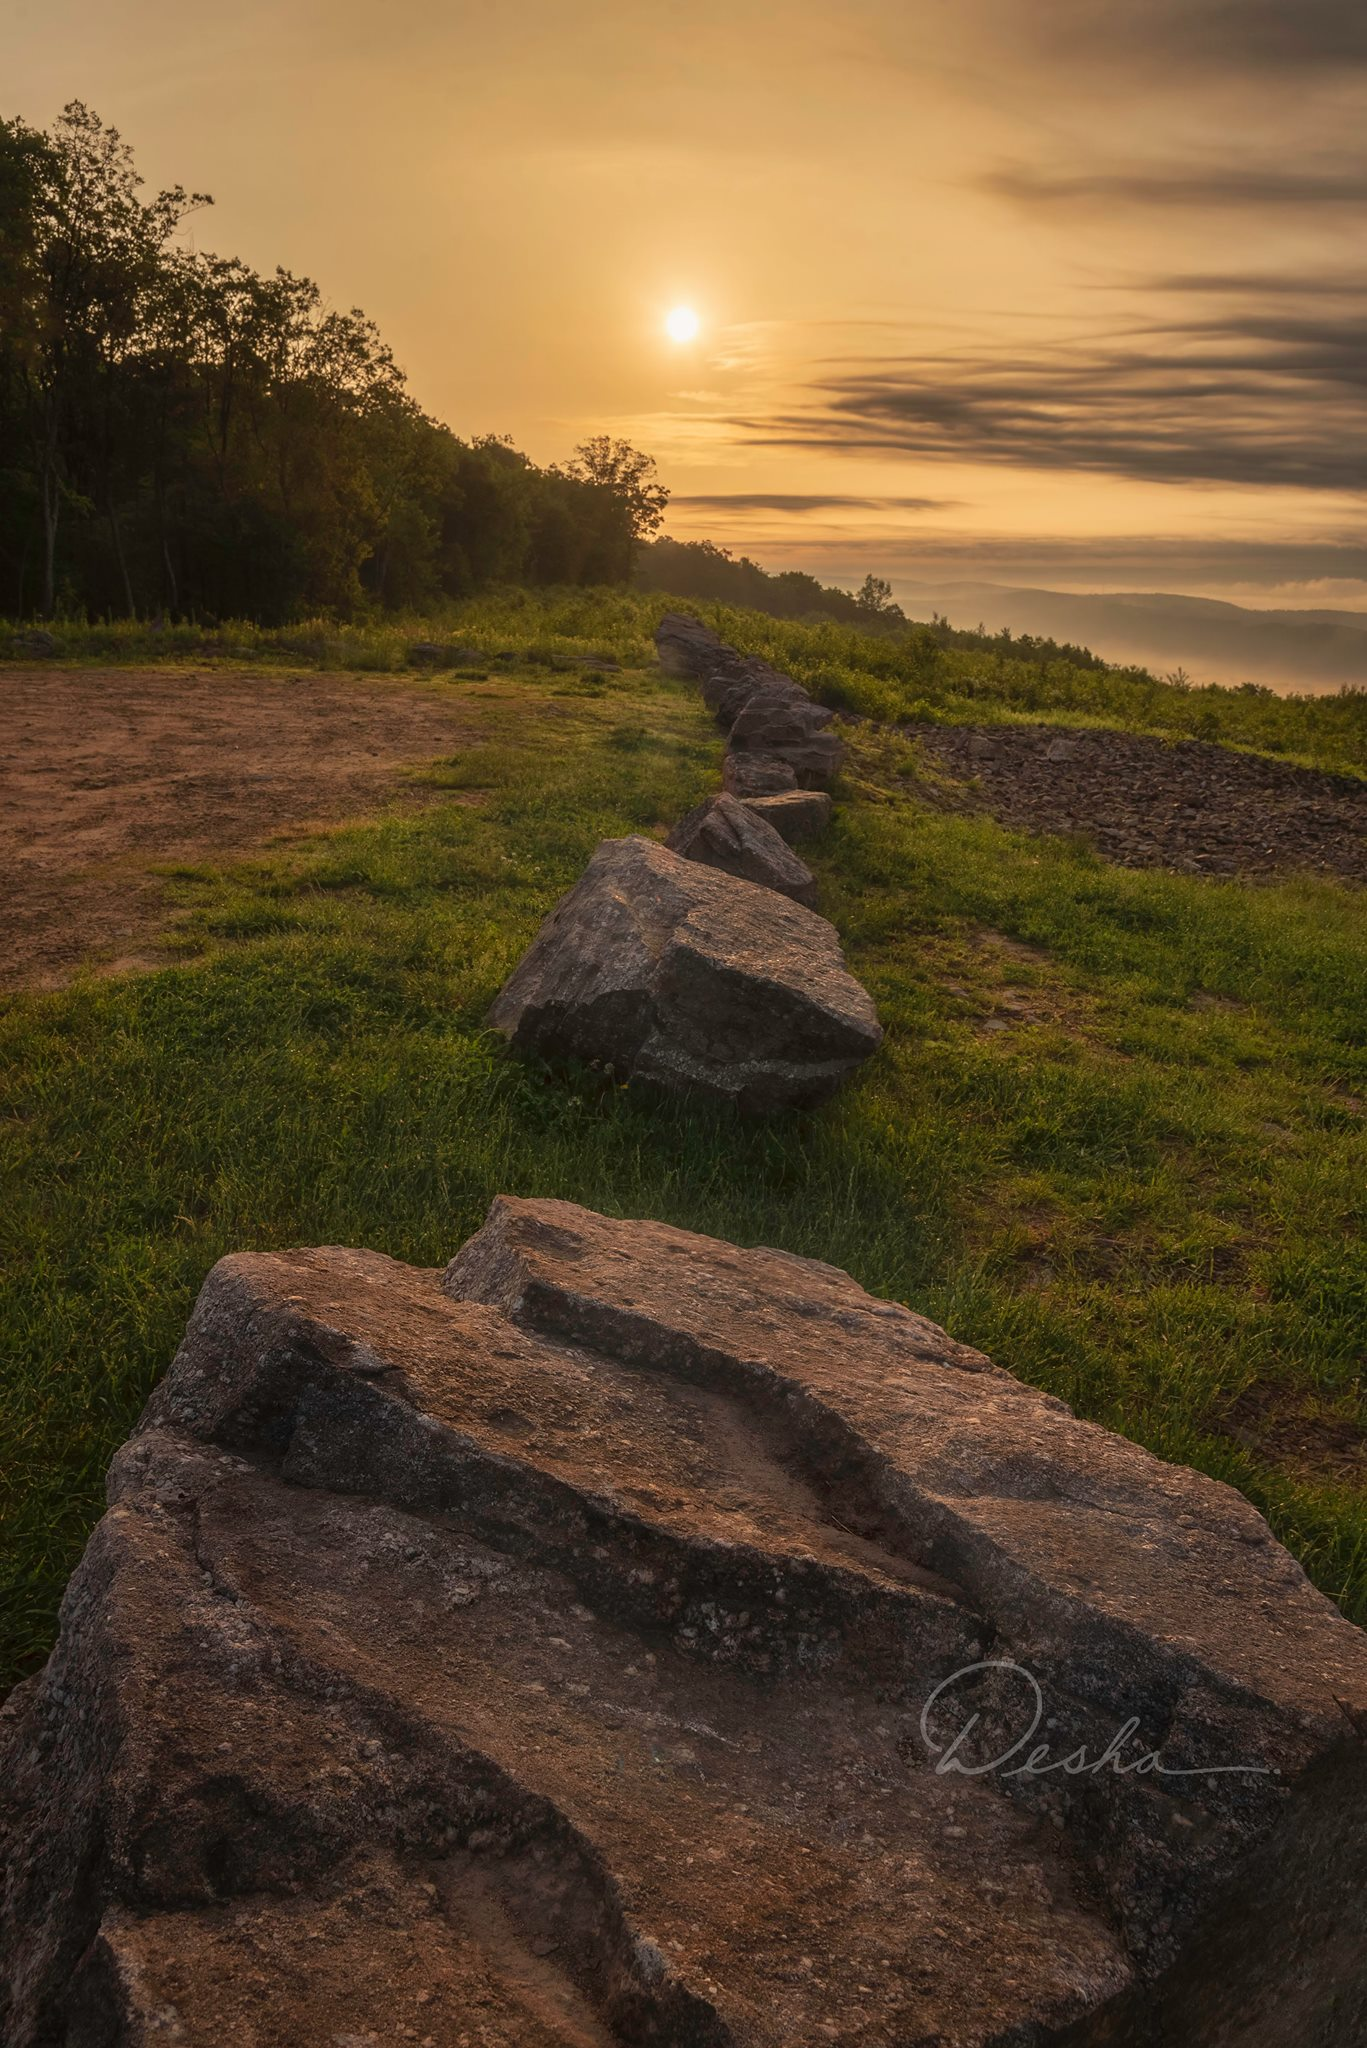 Sunrise 100 Mile View, Jim Thorpe